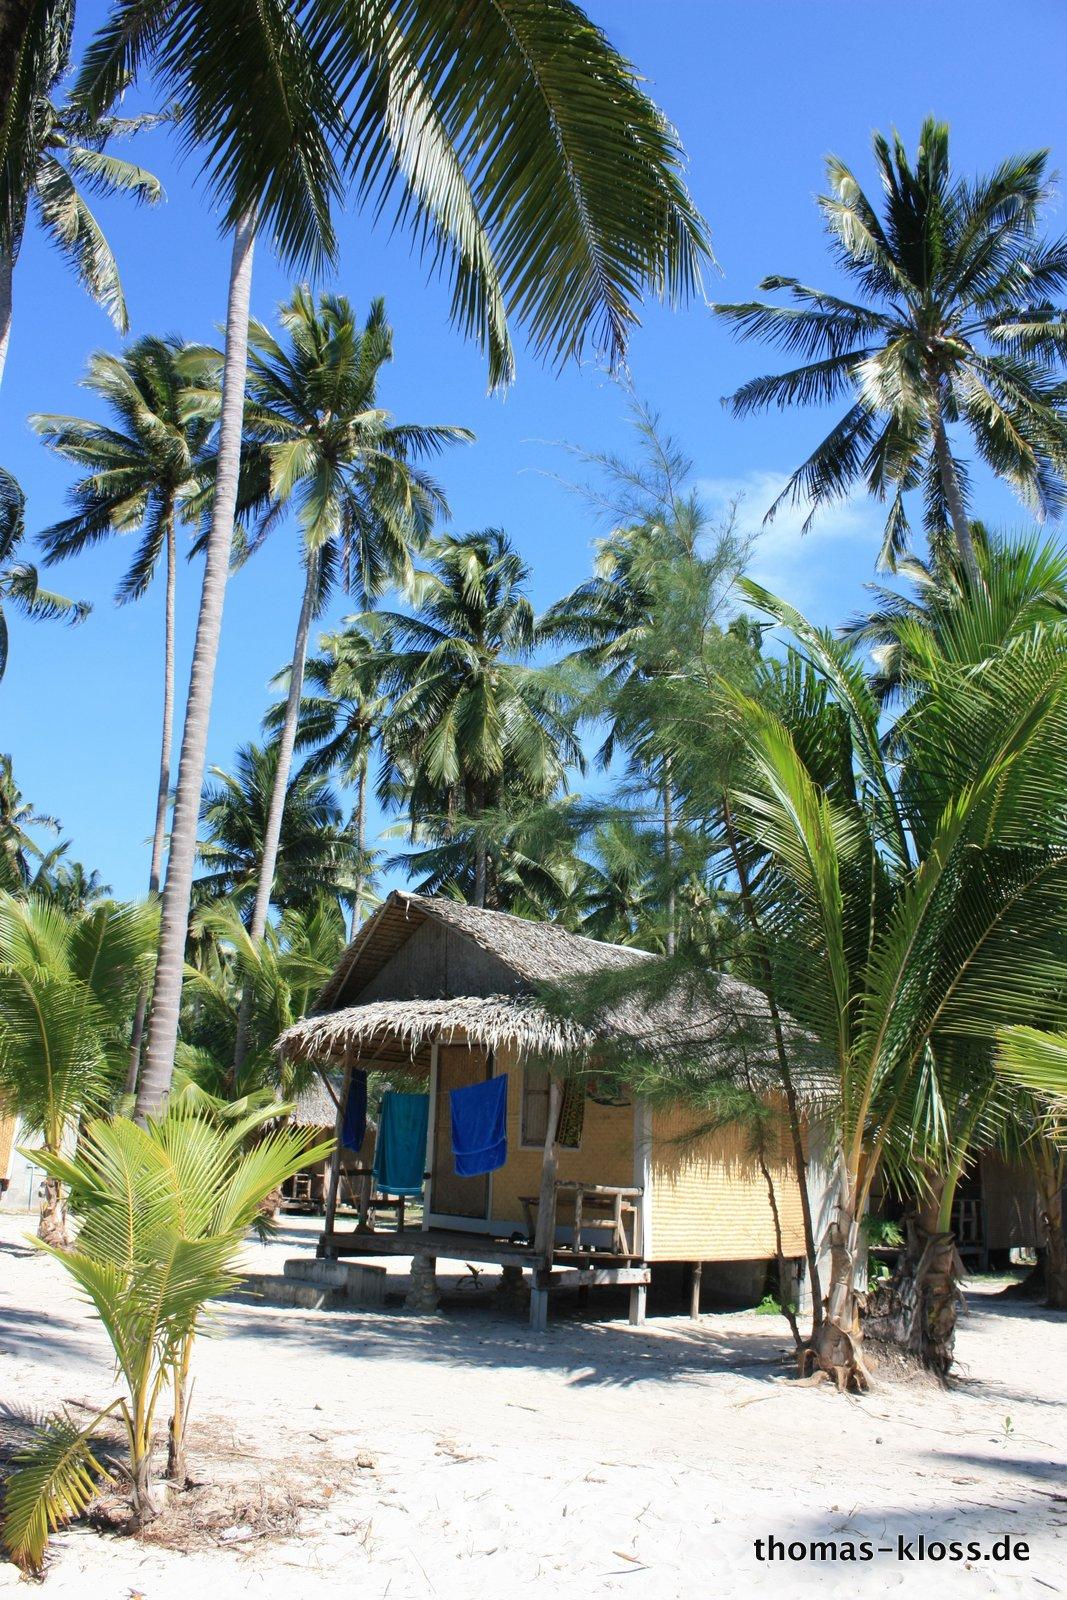 Tiger Hut Bungalows für 600 Baht/pro Tag